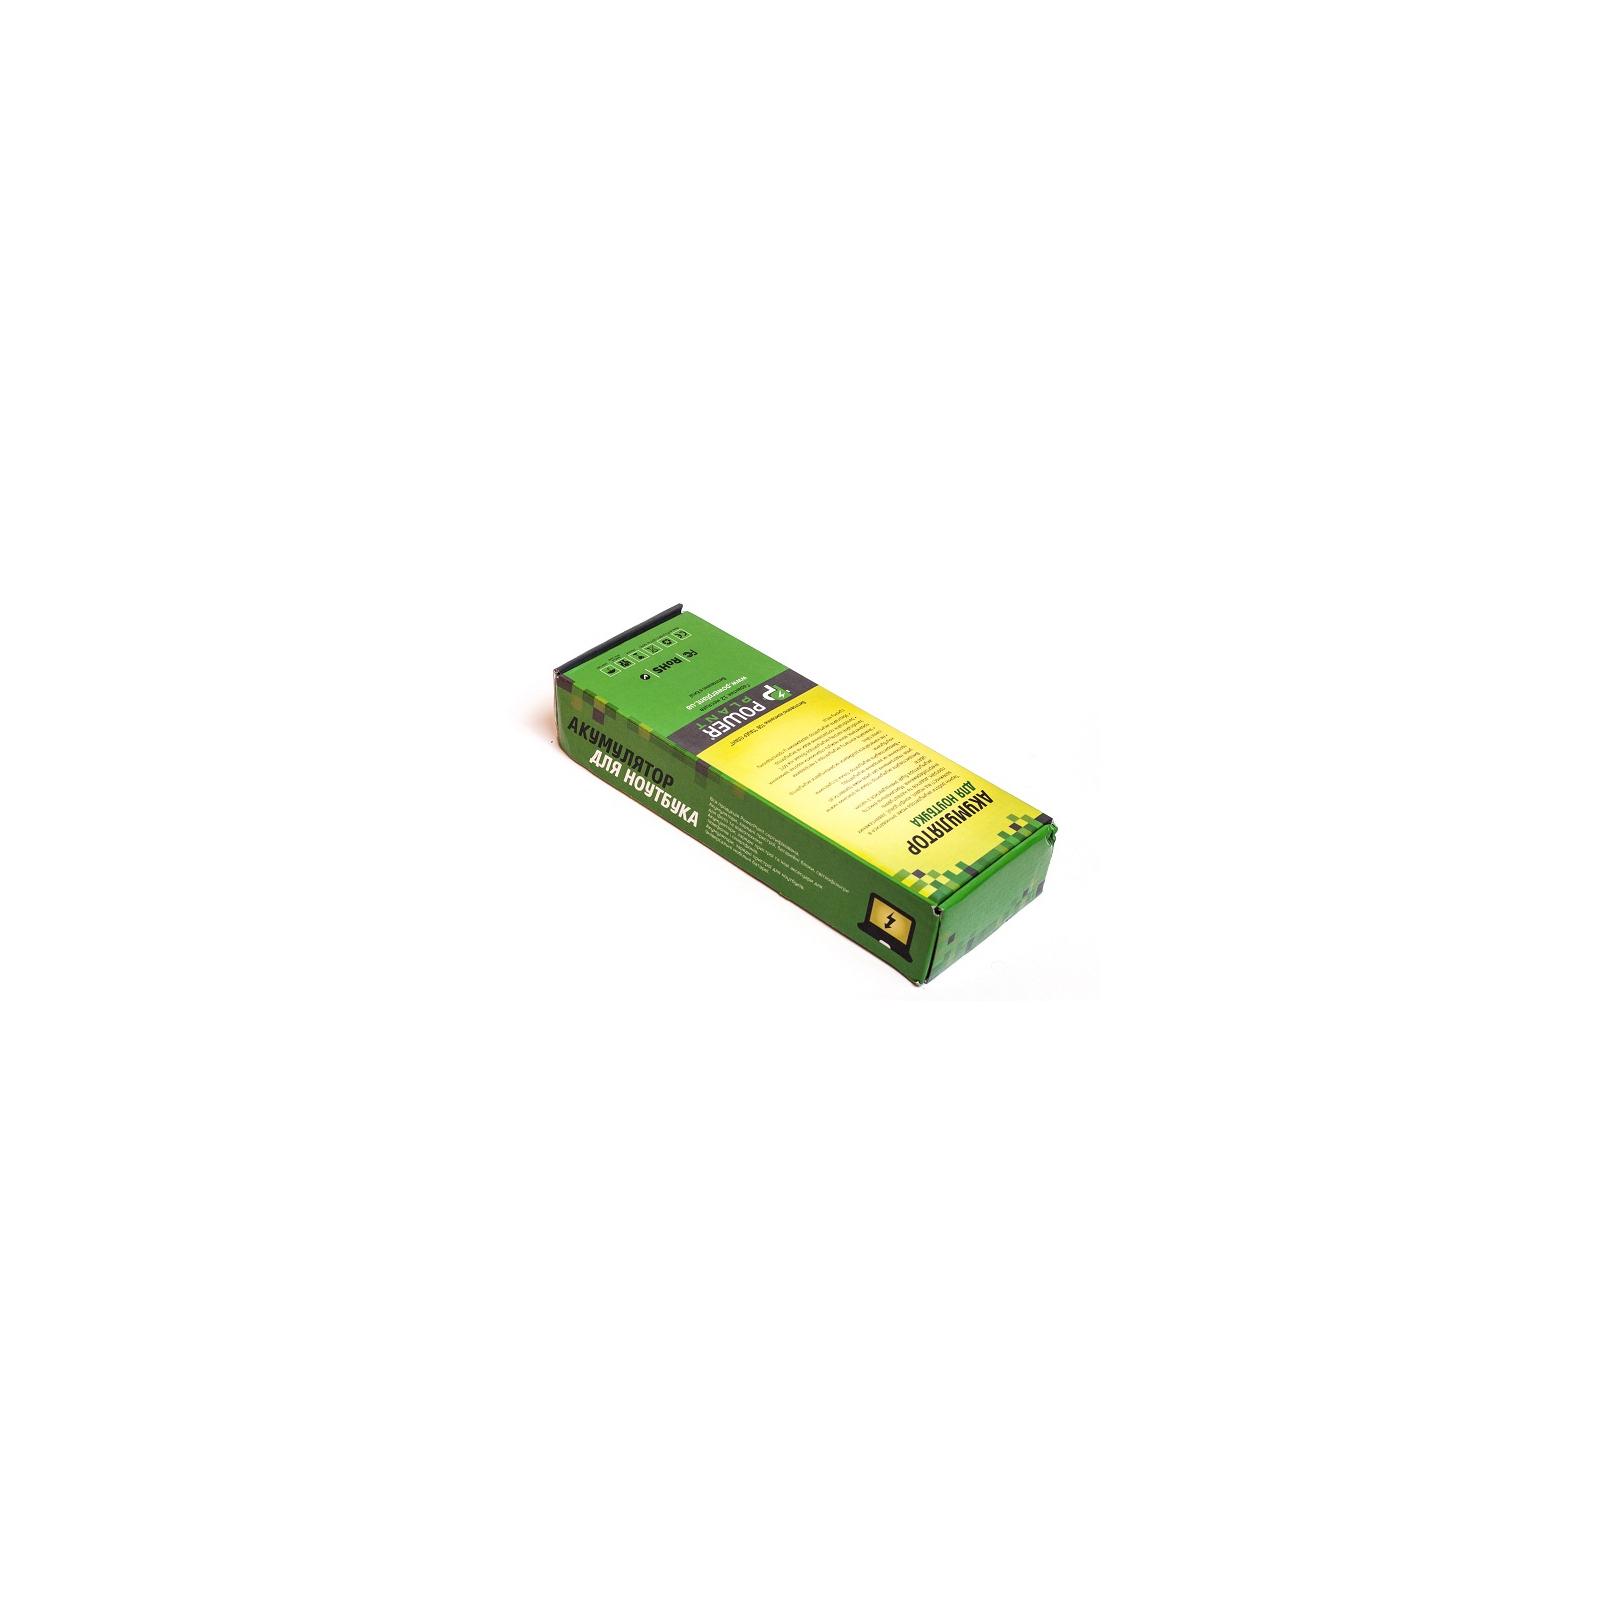 Аккумулятор для ноутбука ASUS EEE PC105 (A32-1015, AS1015LH) 10.8V 5200mAh PowerPlant (NB00000103) изображение 2